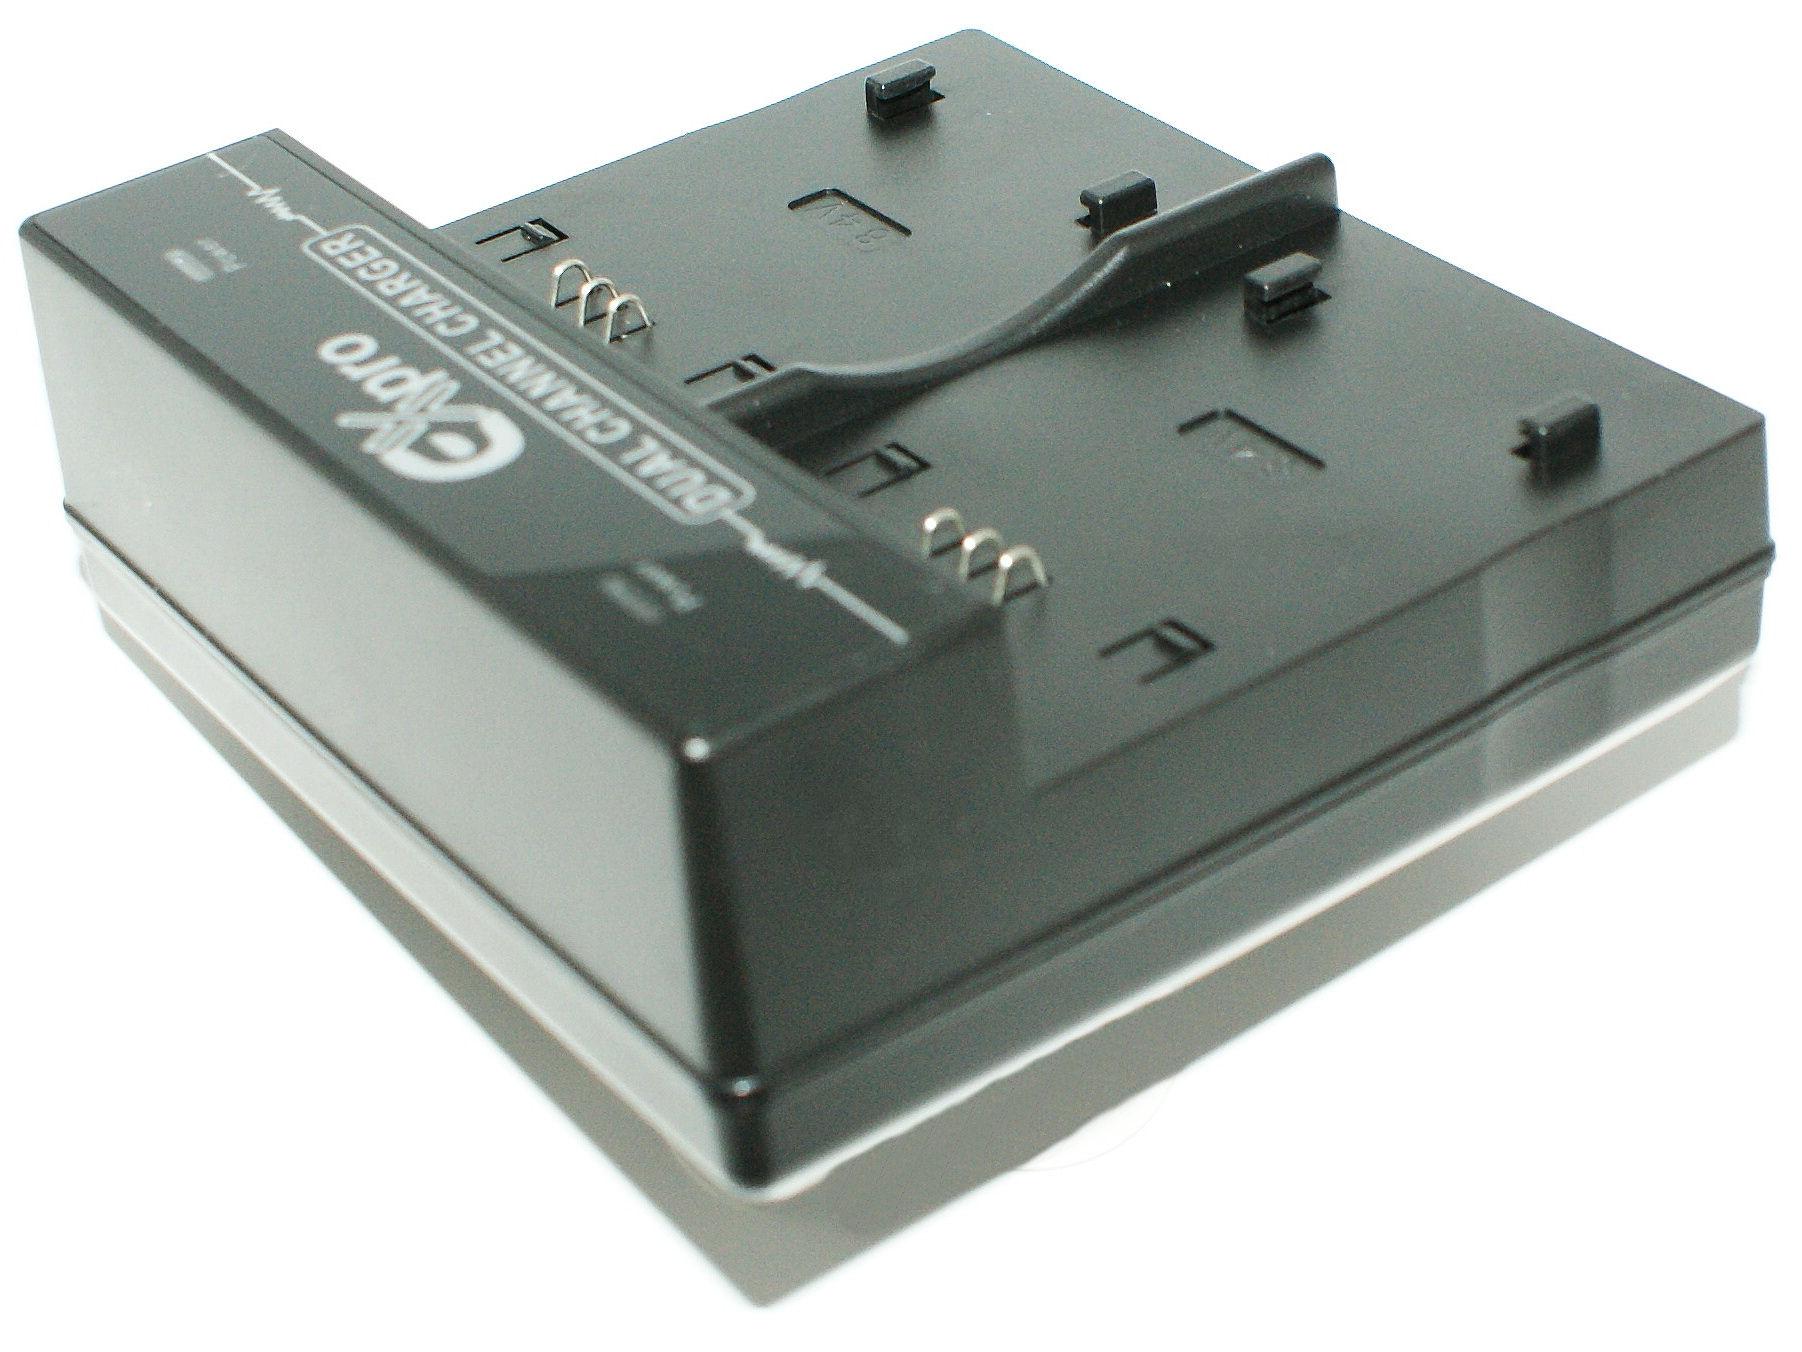 DUAL-Battery-Charger-Fuji-Finepix-F600EXR-F605EXR-Real-3D-W3-X10-X-10 thumbnail 3